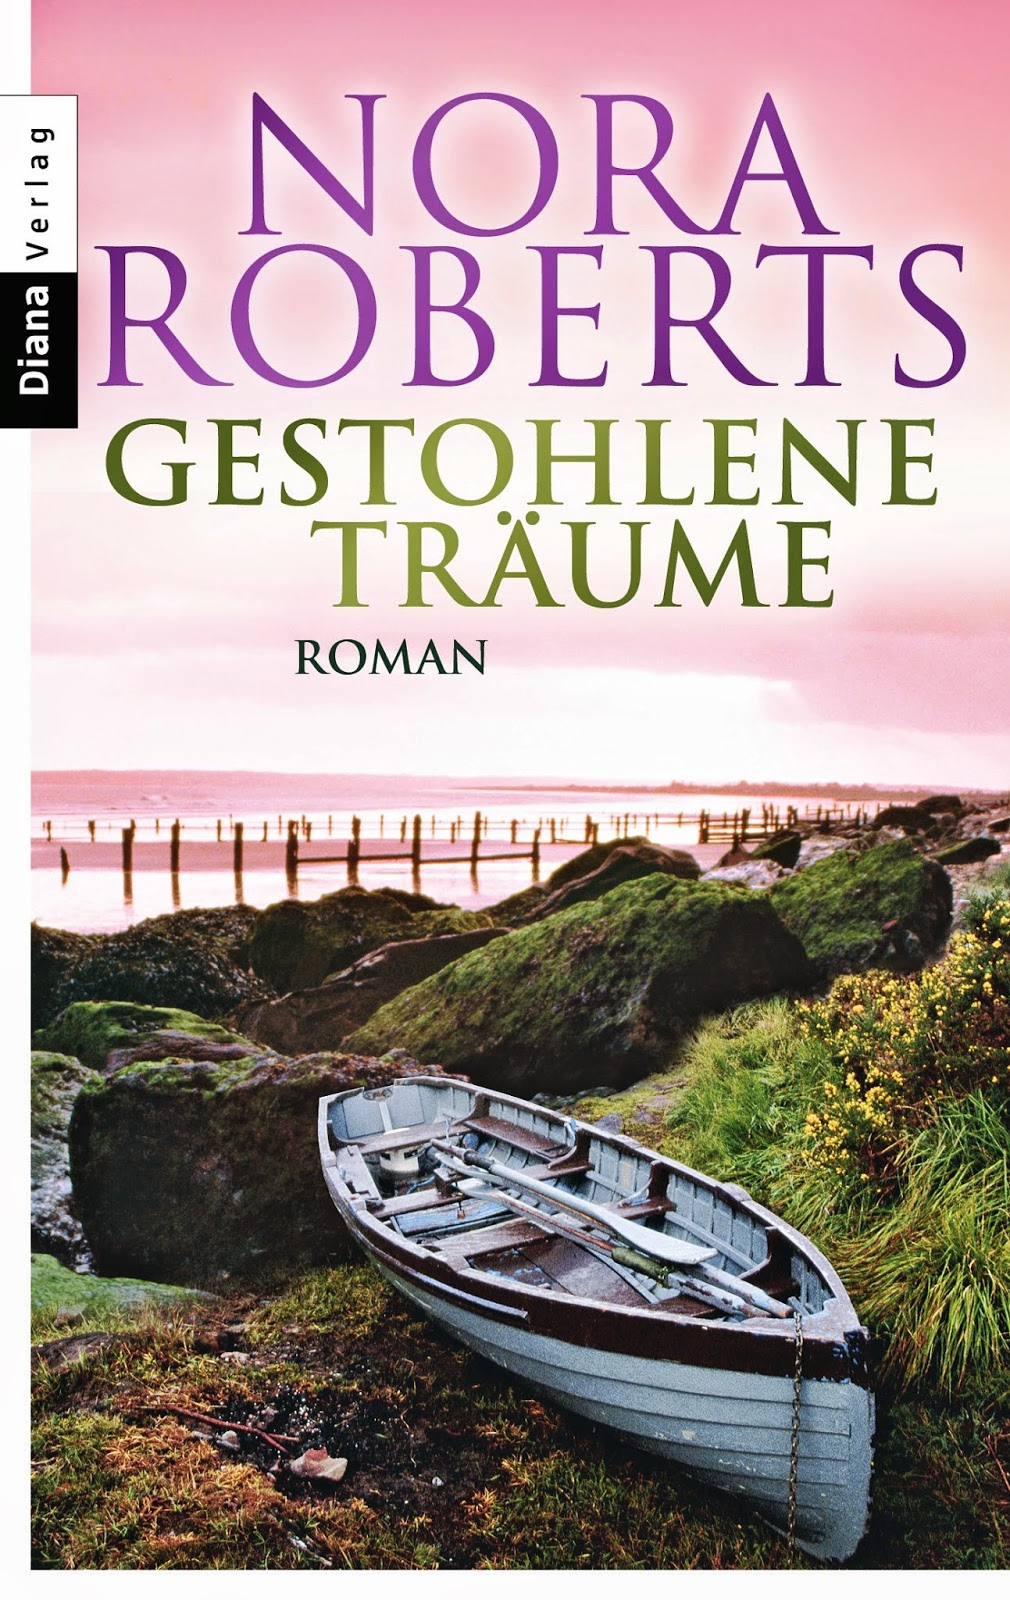 http://www.randomhouse.de/Presse/Taschenbuch/Gestohlene-Traeume-Roman/Nora-Roberts/pr405356.rhd?pub=31000&men=775&mid=5